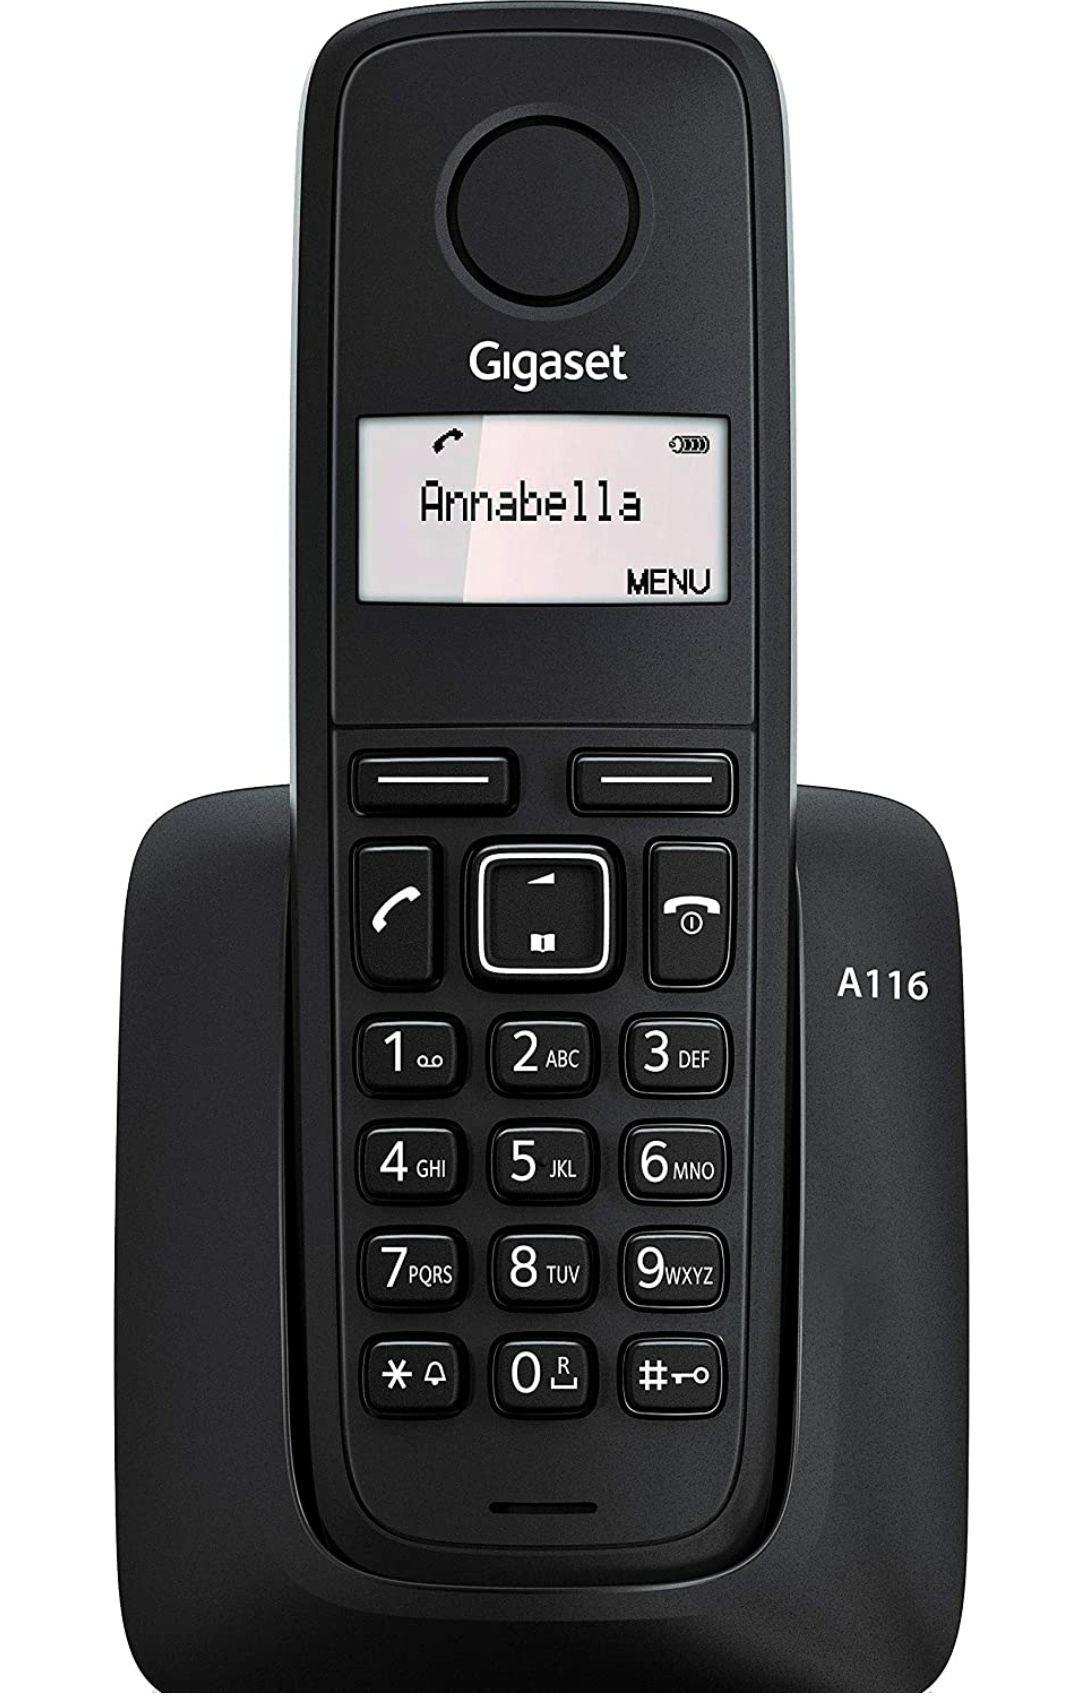 Teléfono fijo inalámbrico Gigaset A116 made in Germany